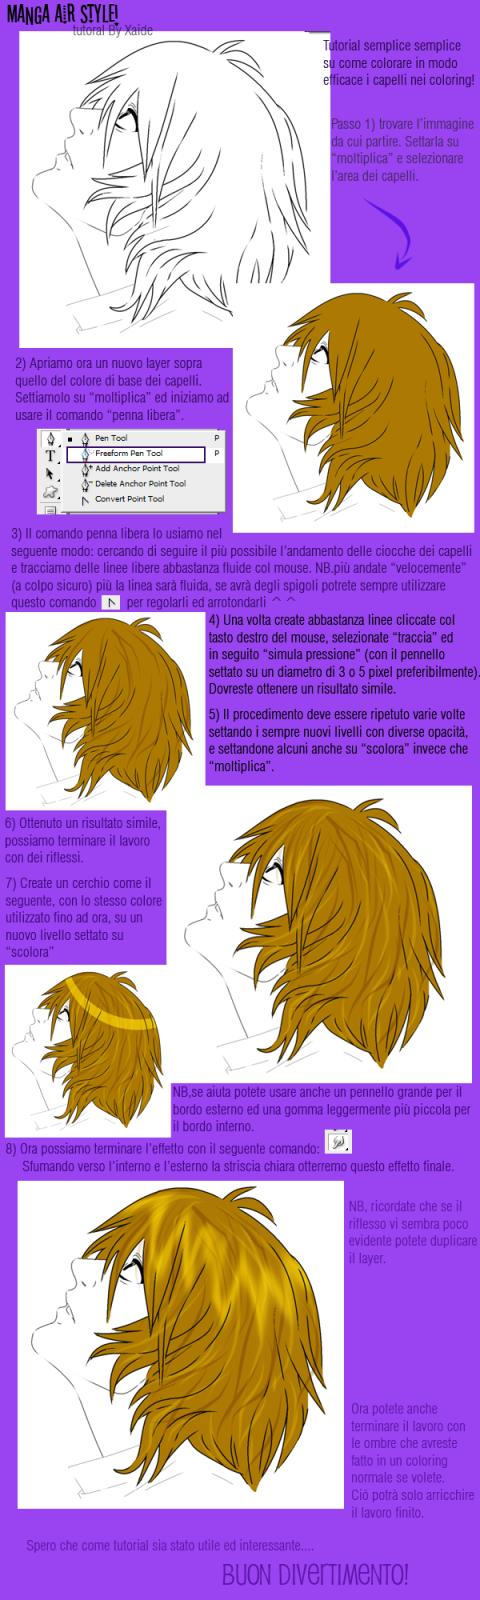 Manga Hair Style by xaide89